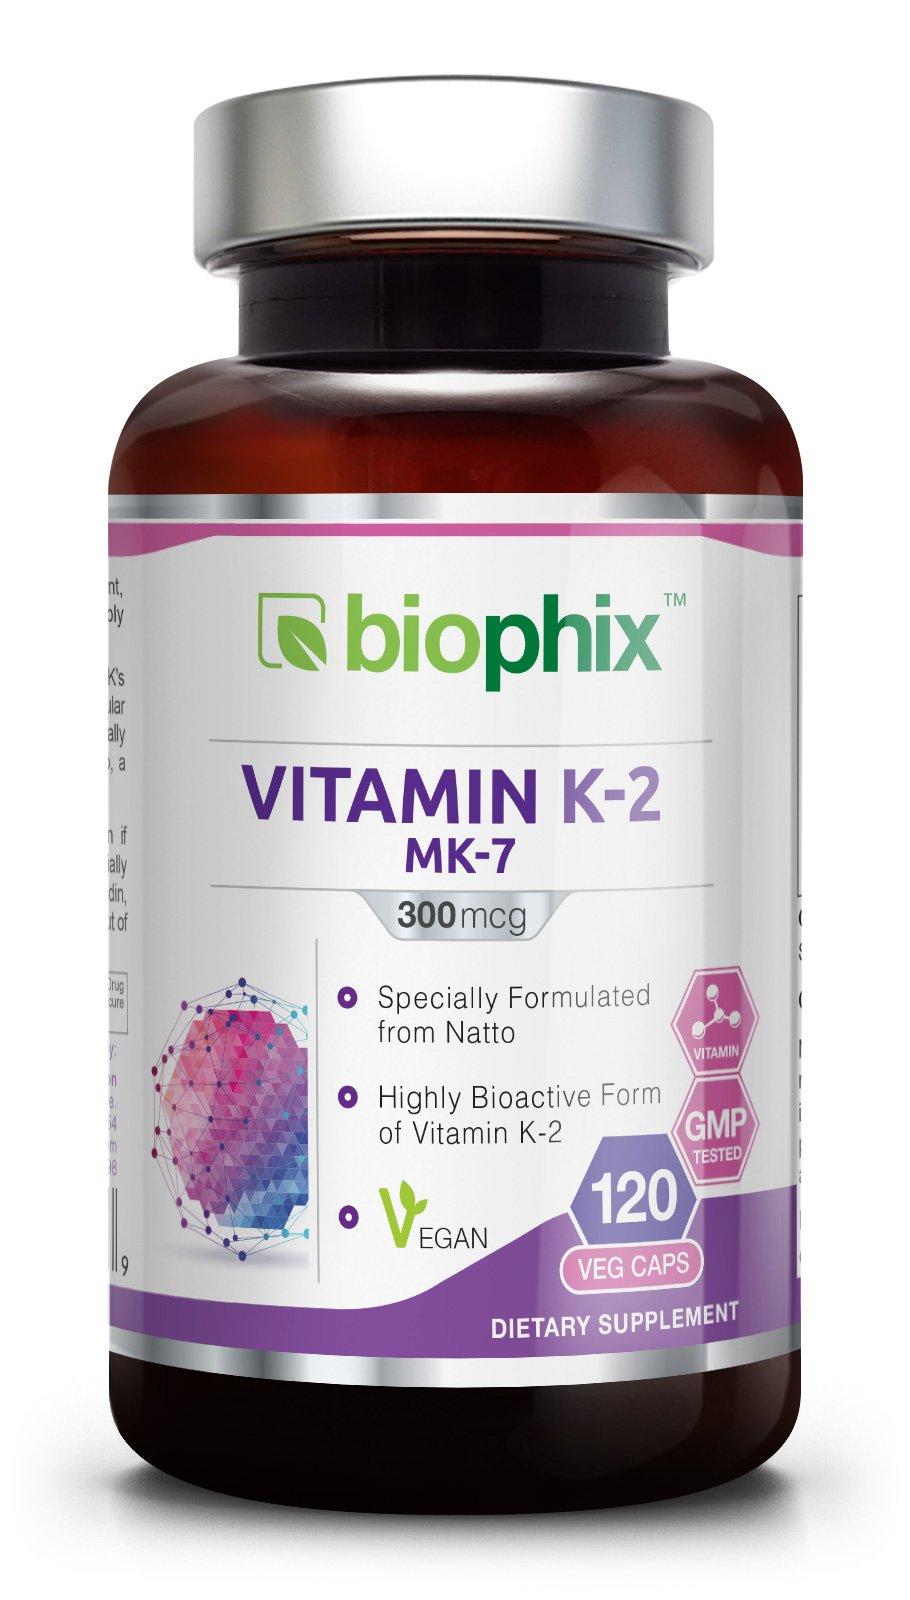 Vitamin K2 MK-7-300 mcg 120 Vcaps - High-Potency | Strong Bones | Immune Health | Support for D3 by biophix